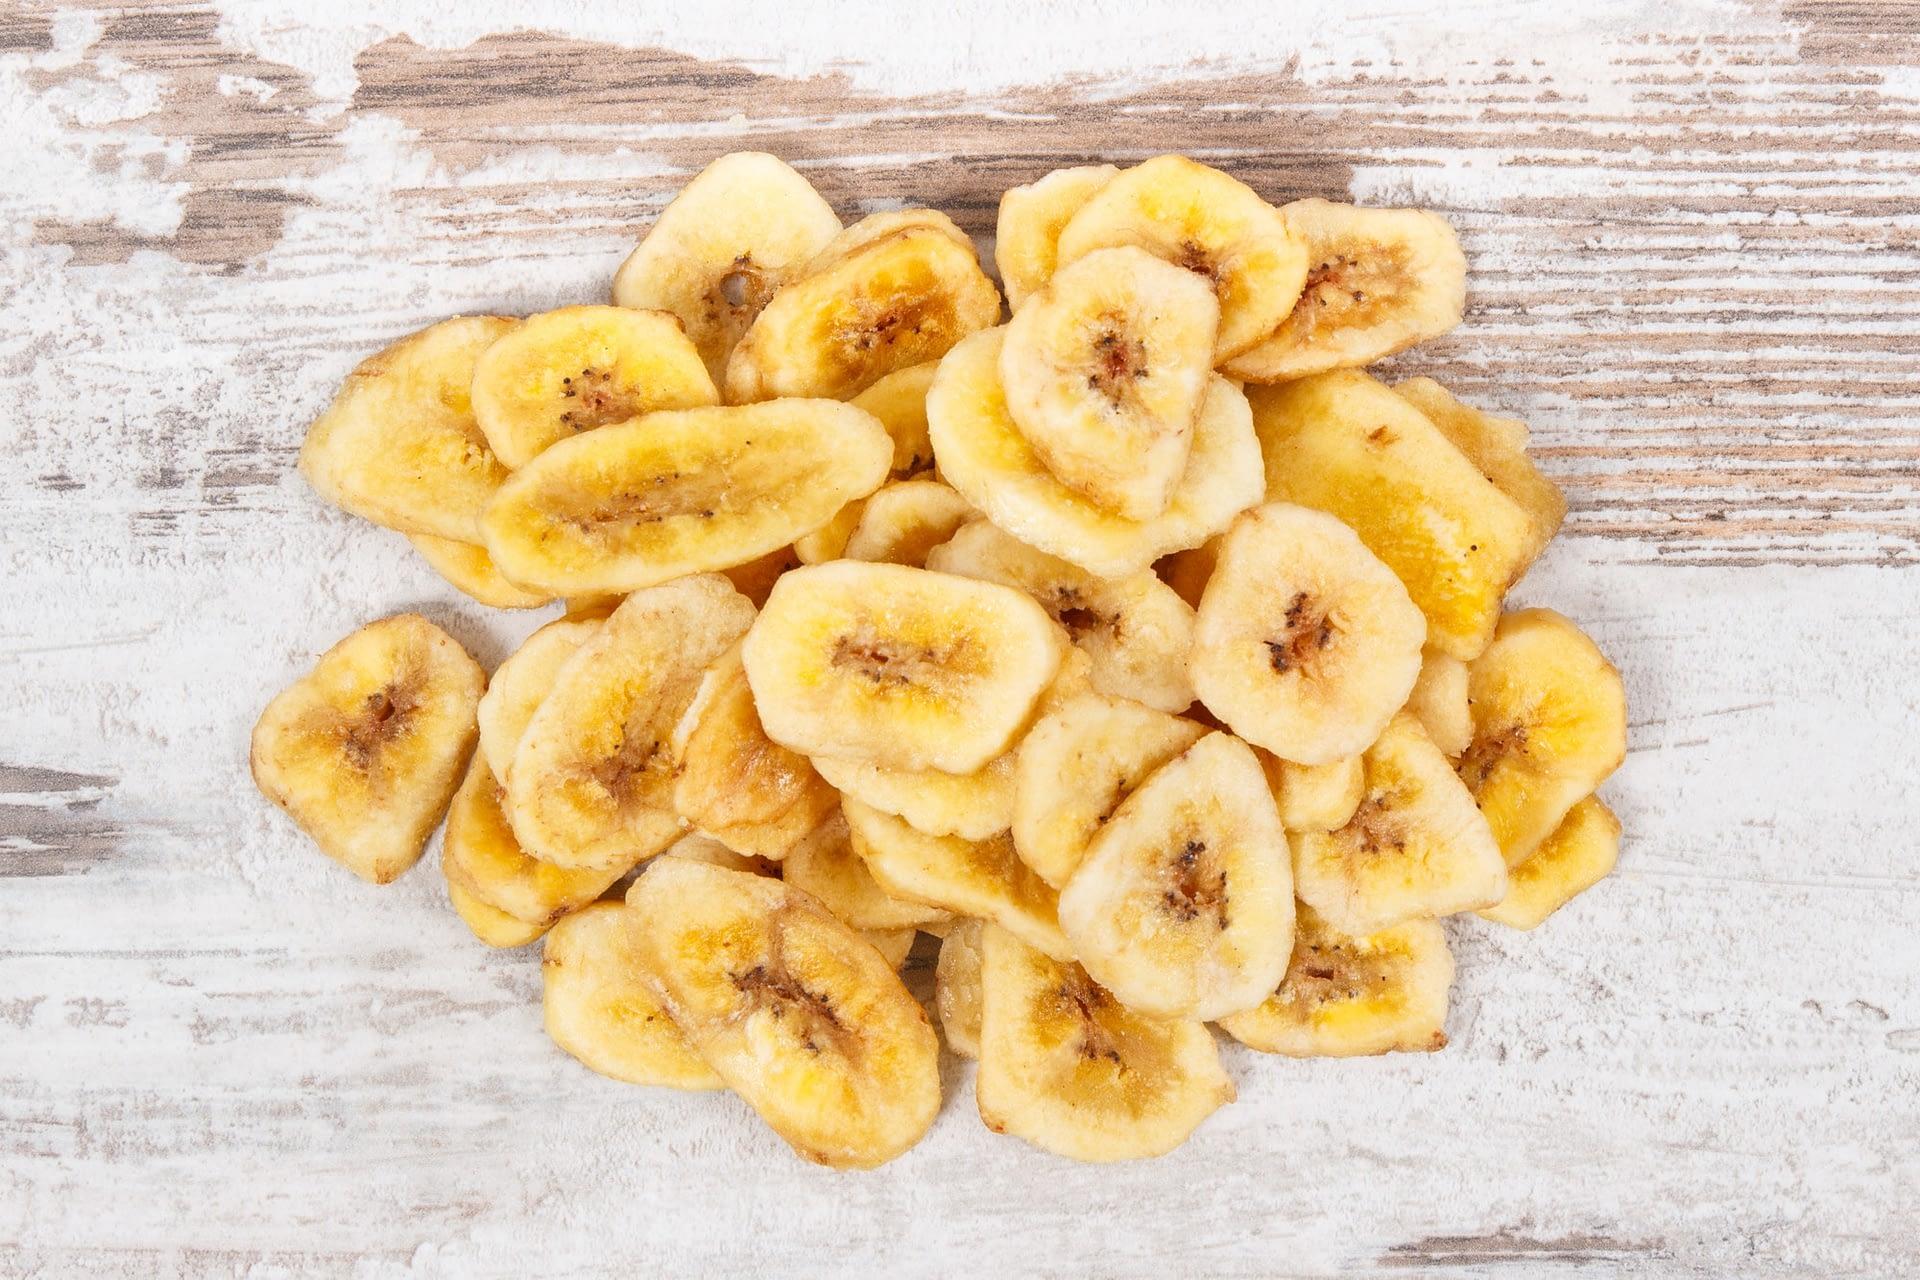 Dried organic banana chips on rustic board